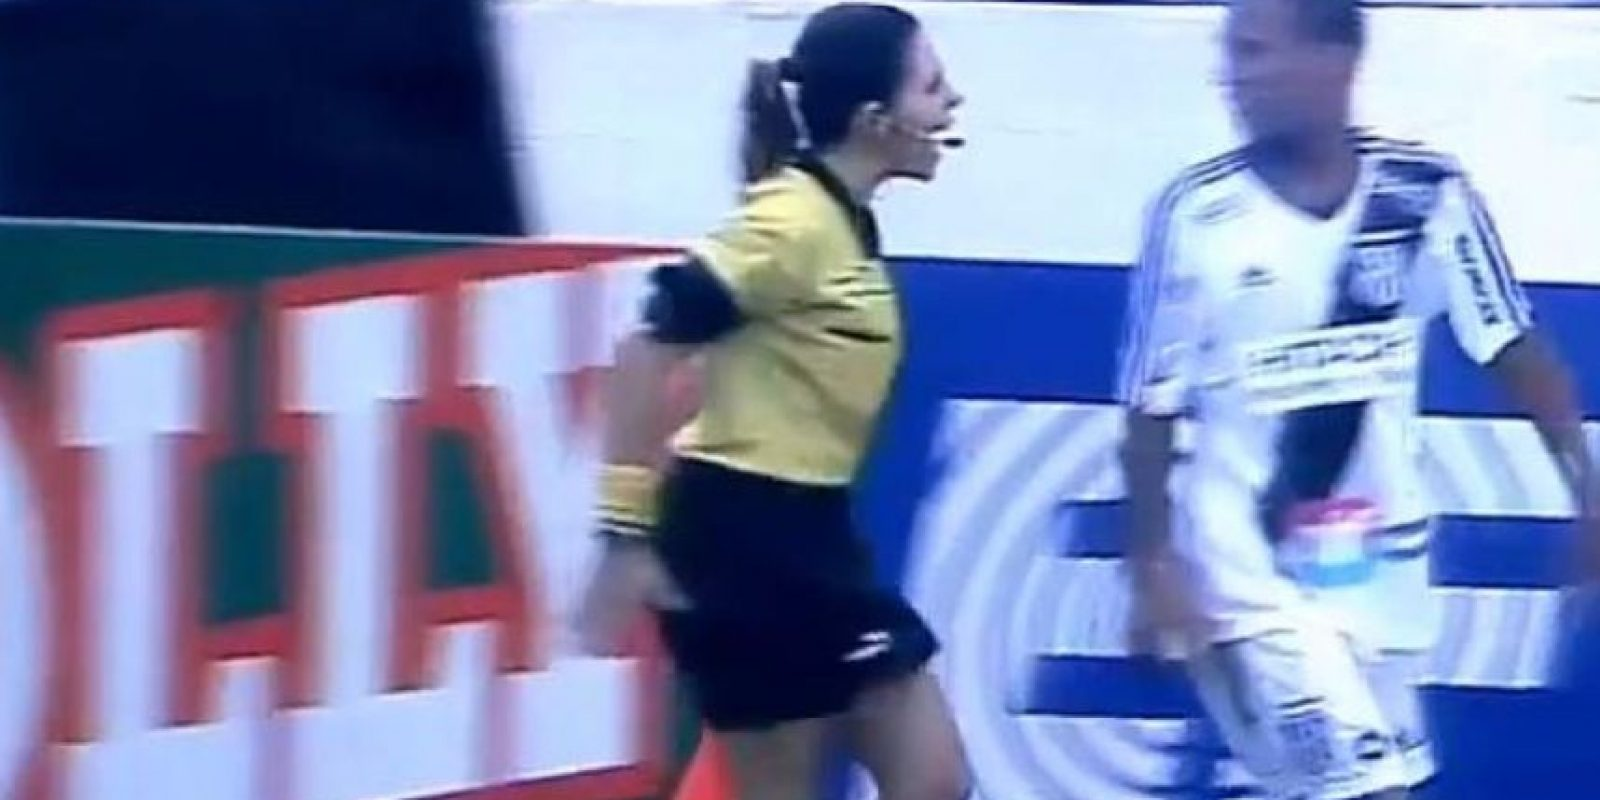 Tatiane Sacilotti no se inmutó ante el futbolista contrario. Foto:Twitter